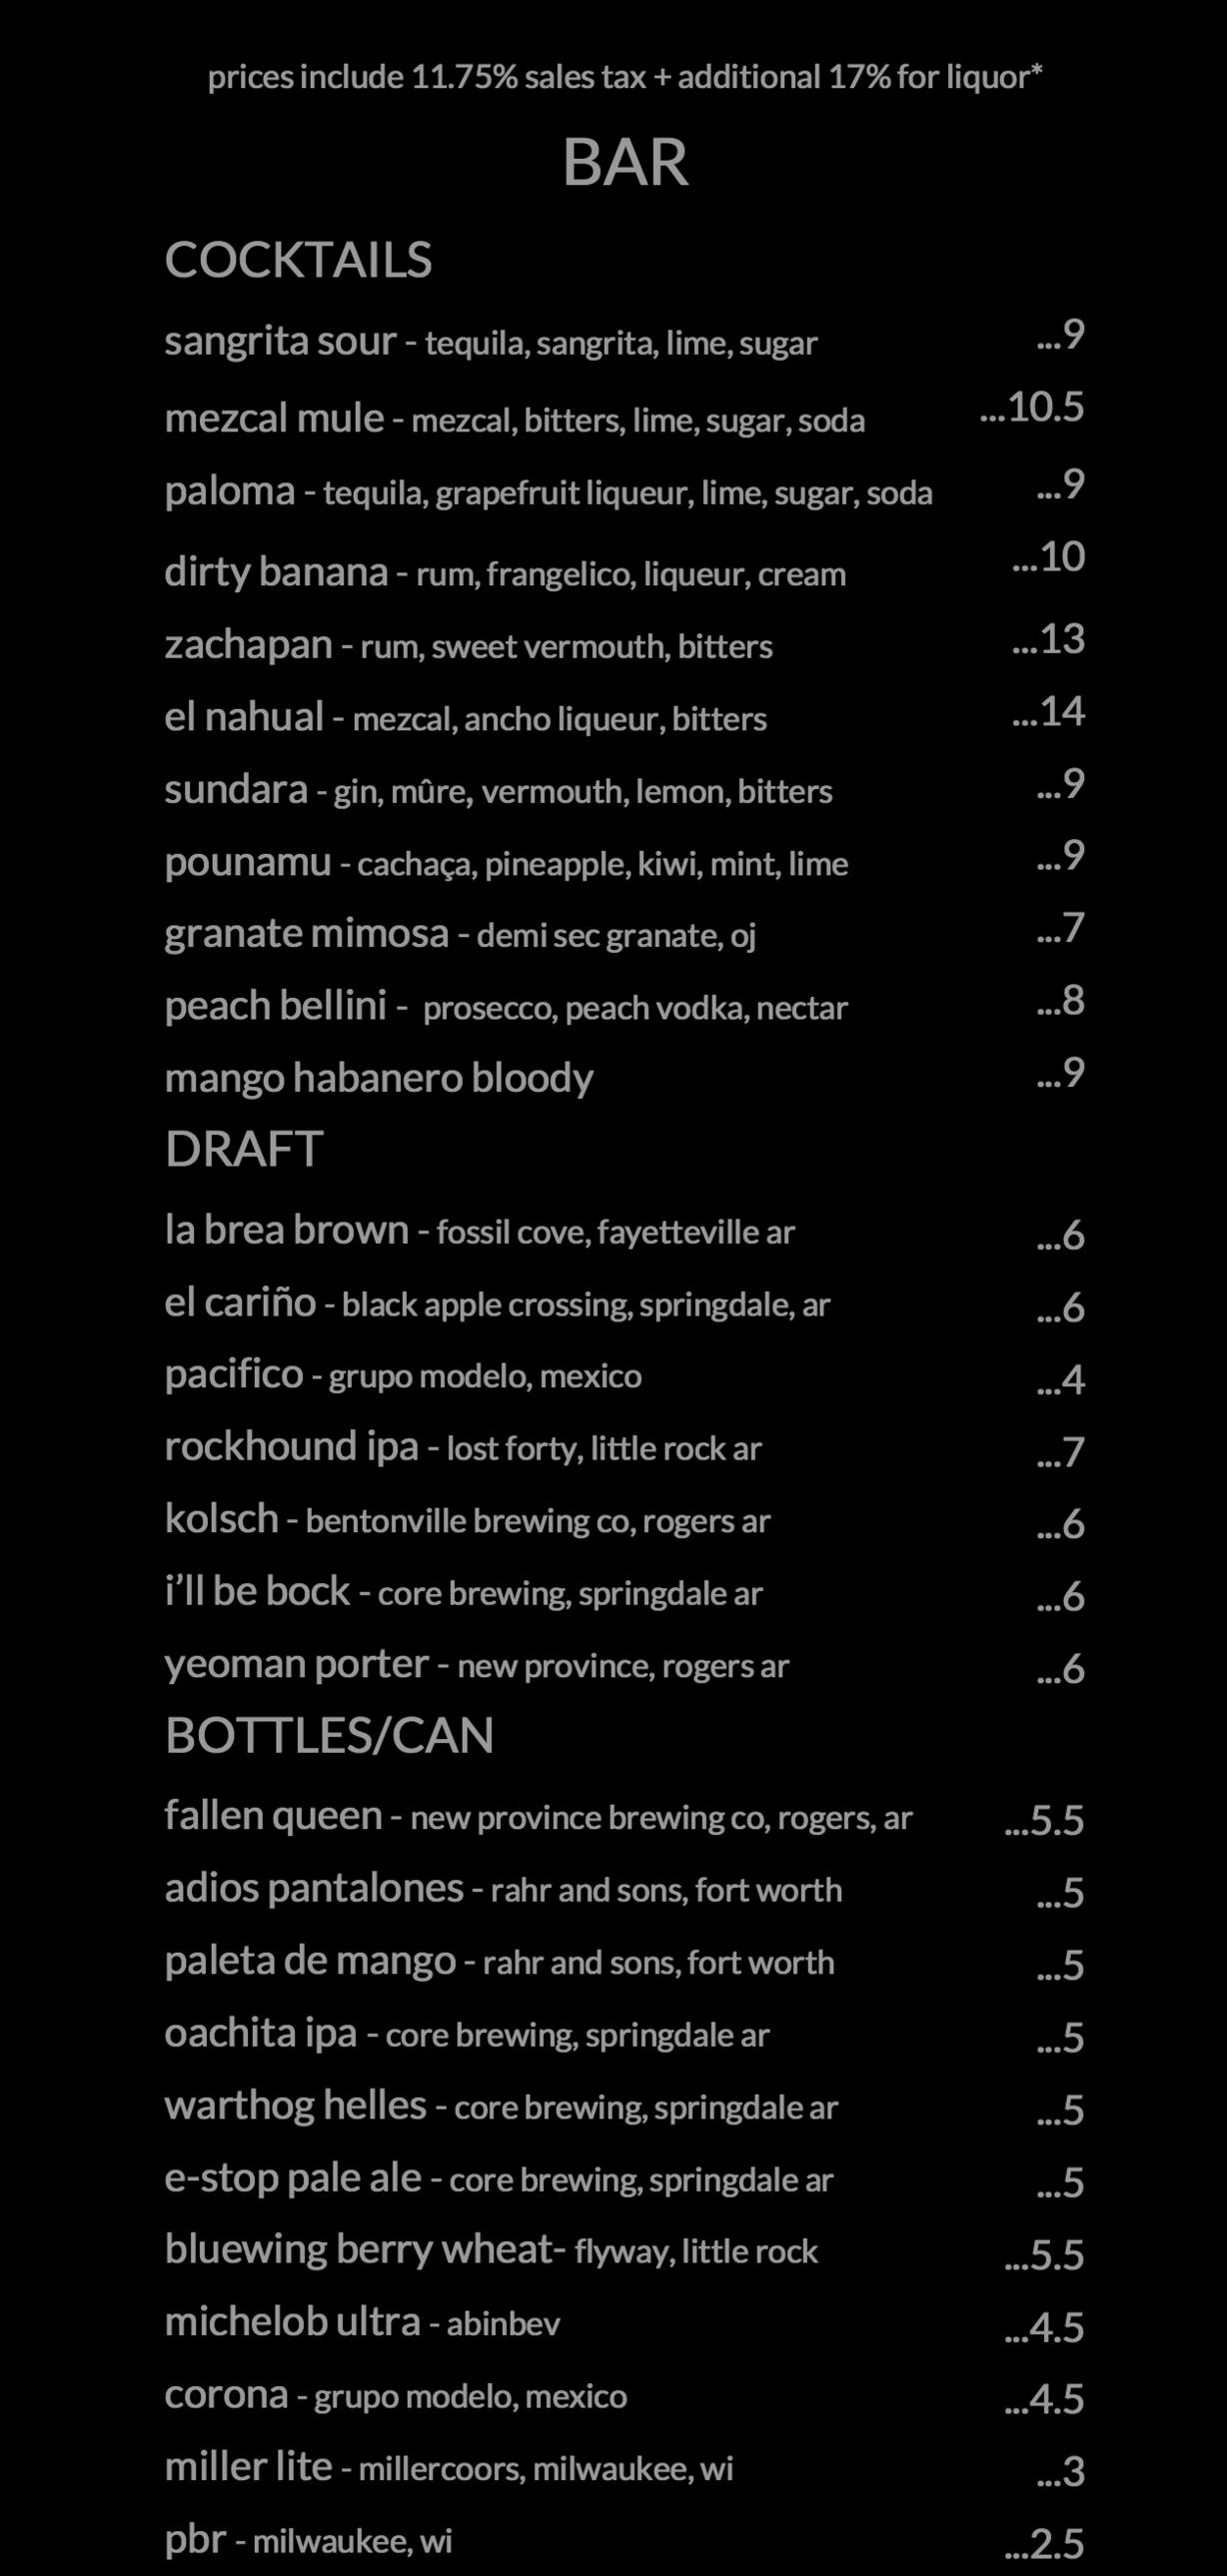 CocktailMenuWebsite.png